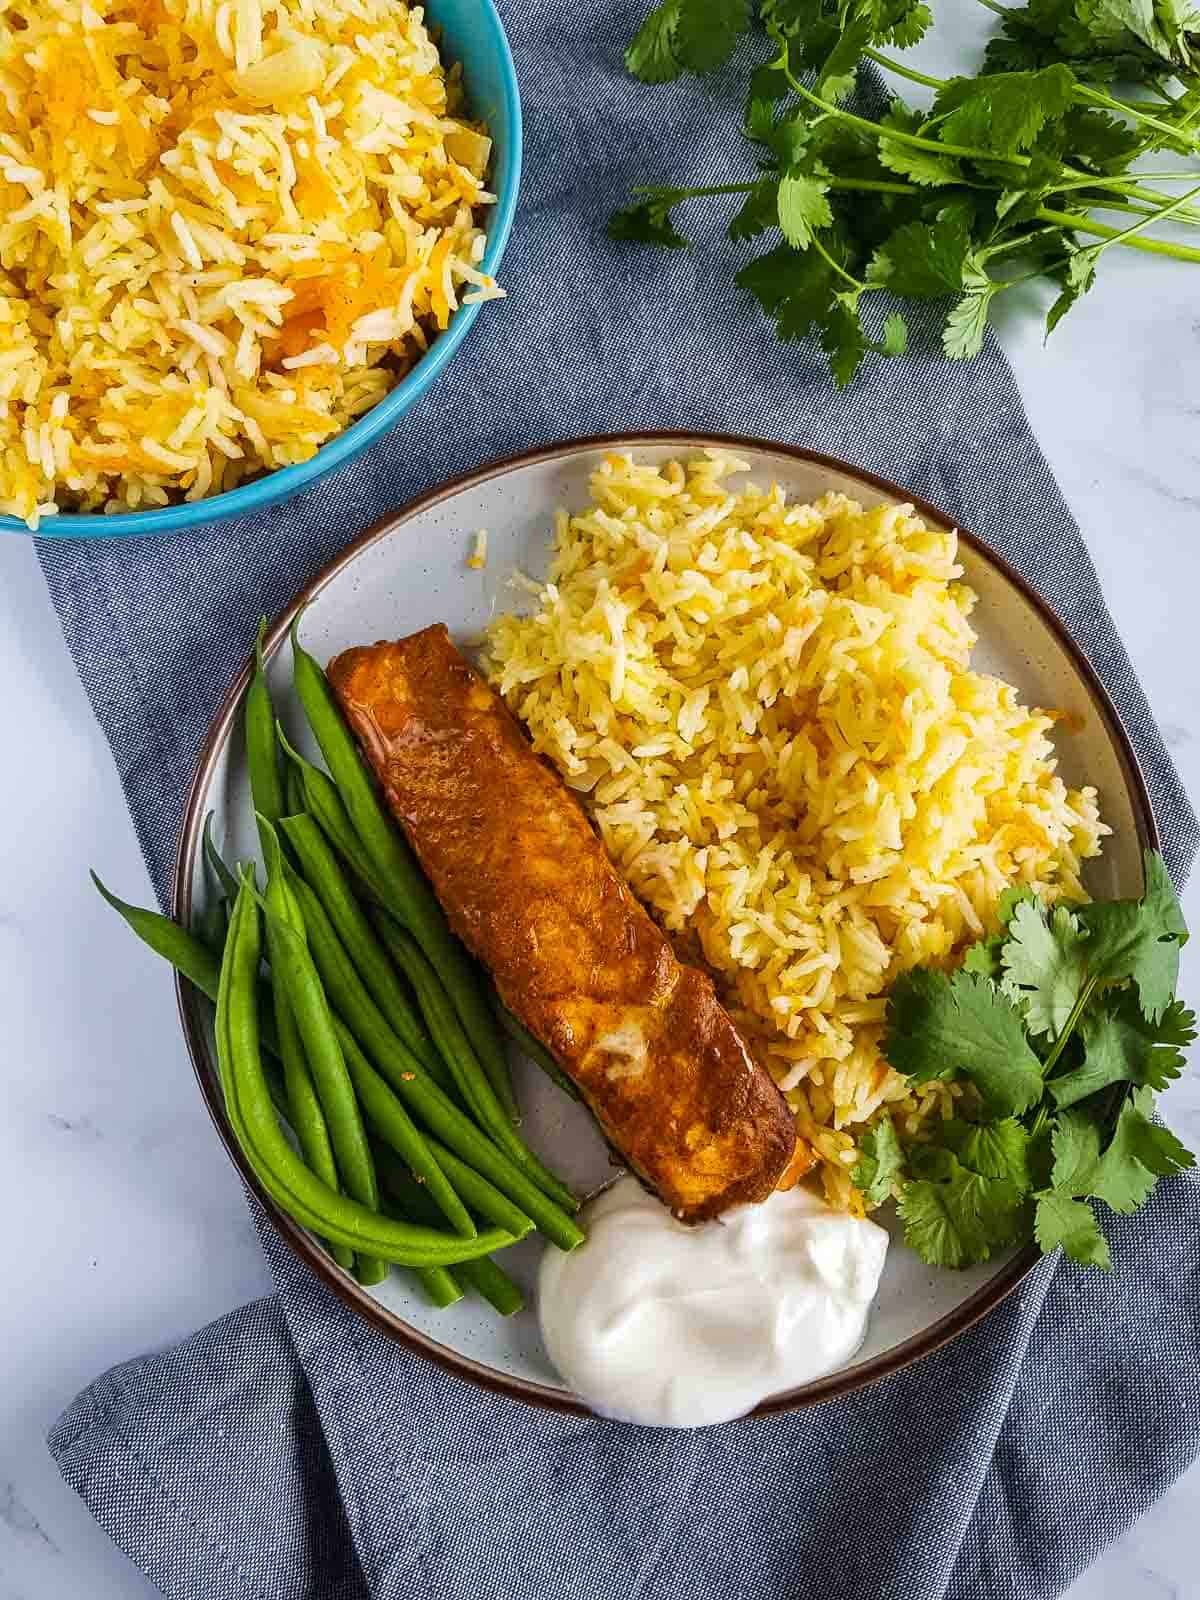 A dinner plate with tandoori marinated salmon.